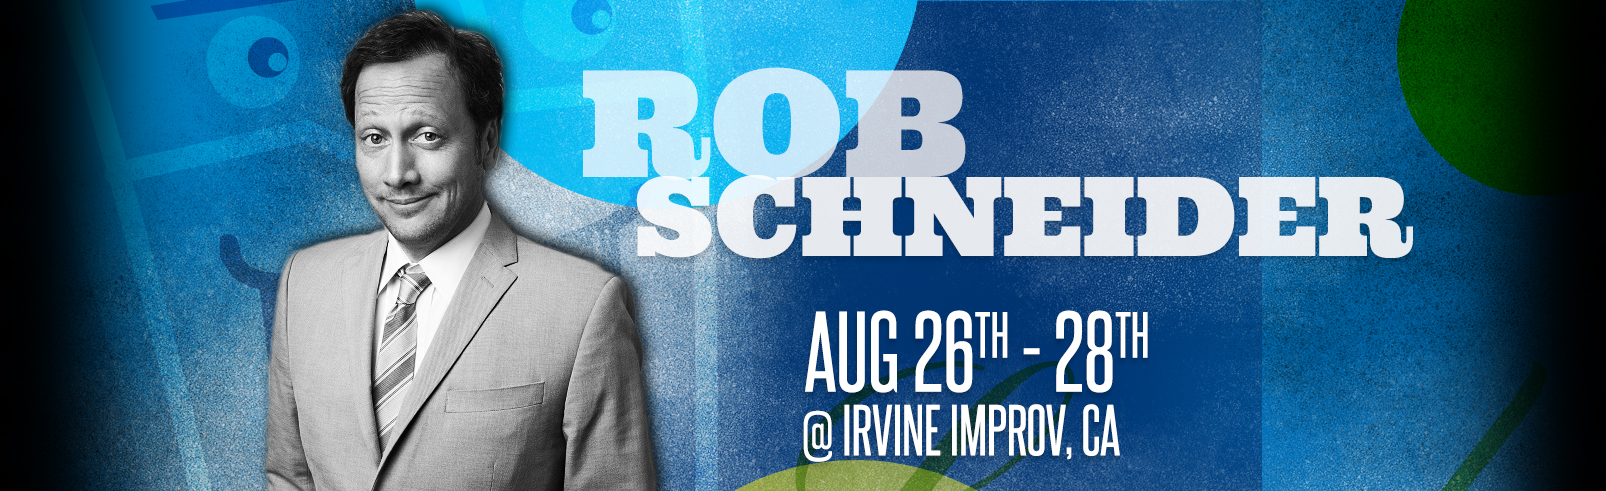 Rob Schneider @ Irvine Improv